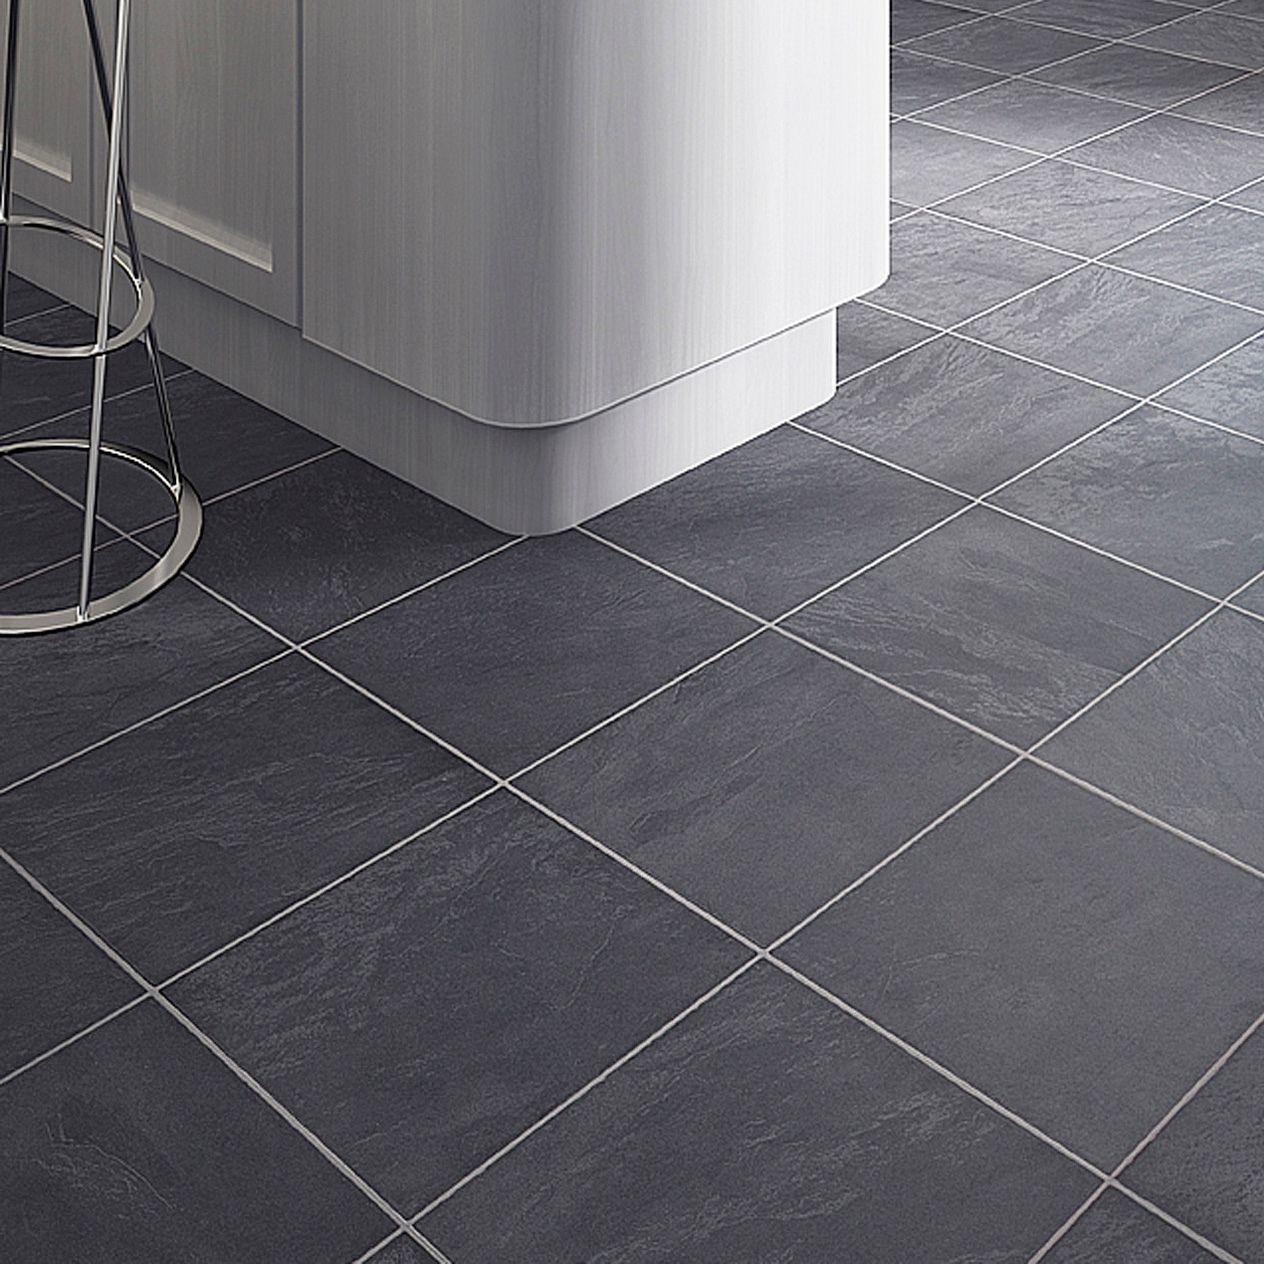 Awesome Black Slate Tile Effect Laminate Flooring B Q And Description Tile Effect Laminate Flooring Tile Effect Laminate Tile Floor Diy